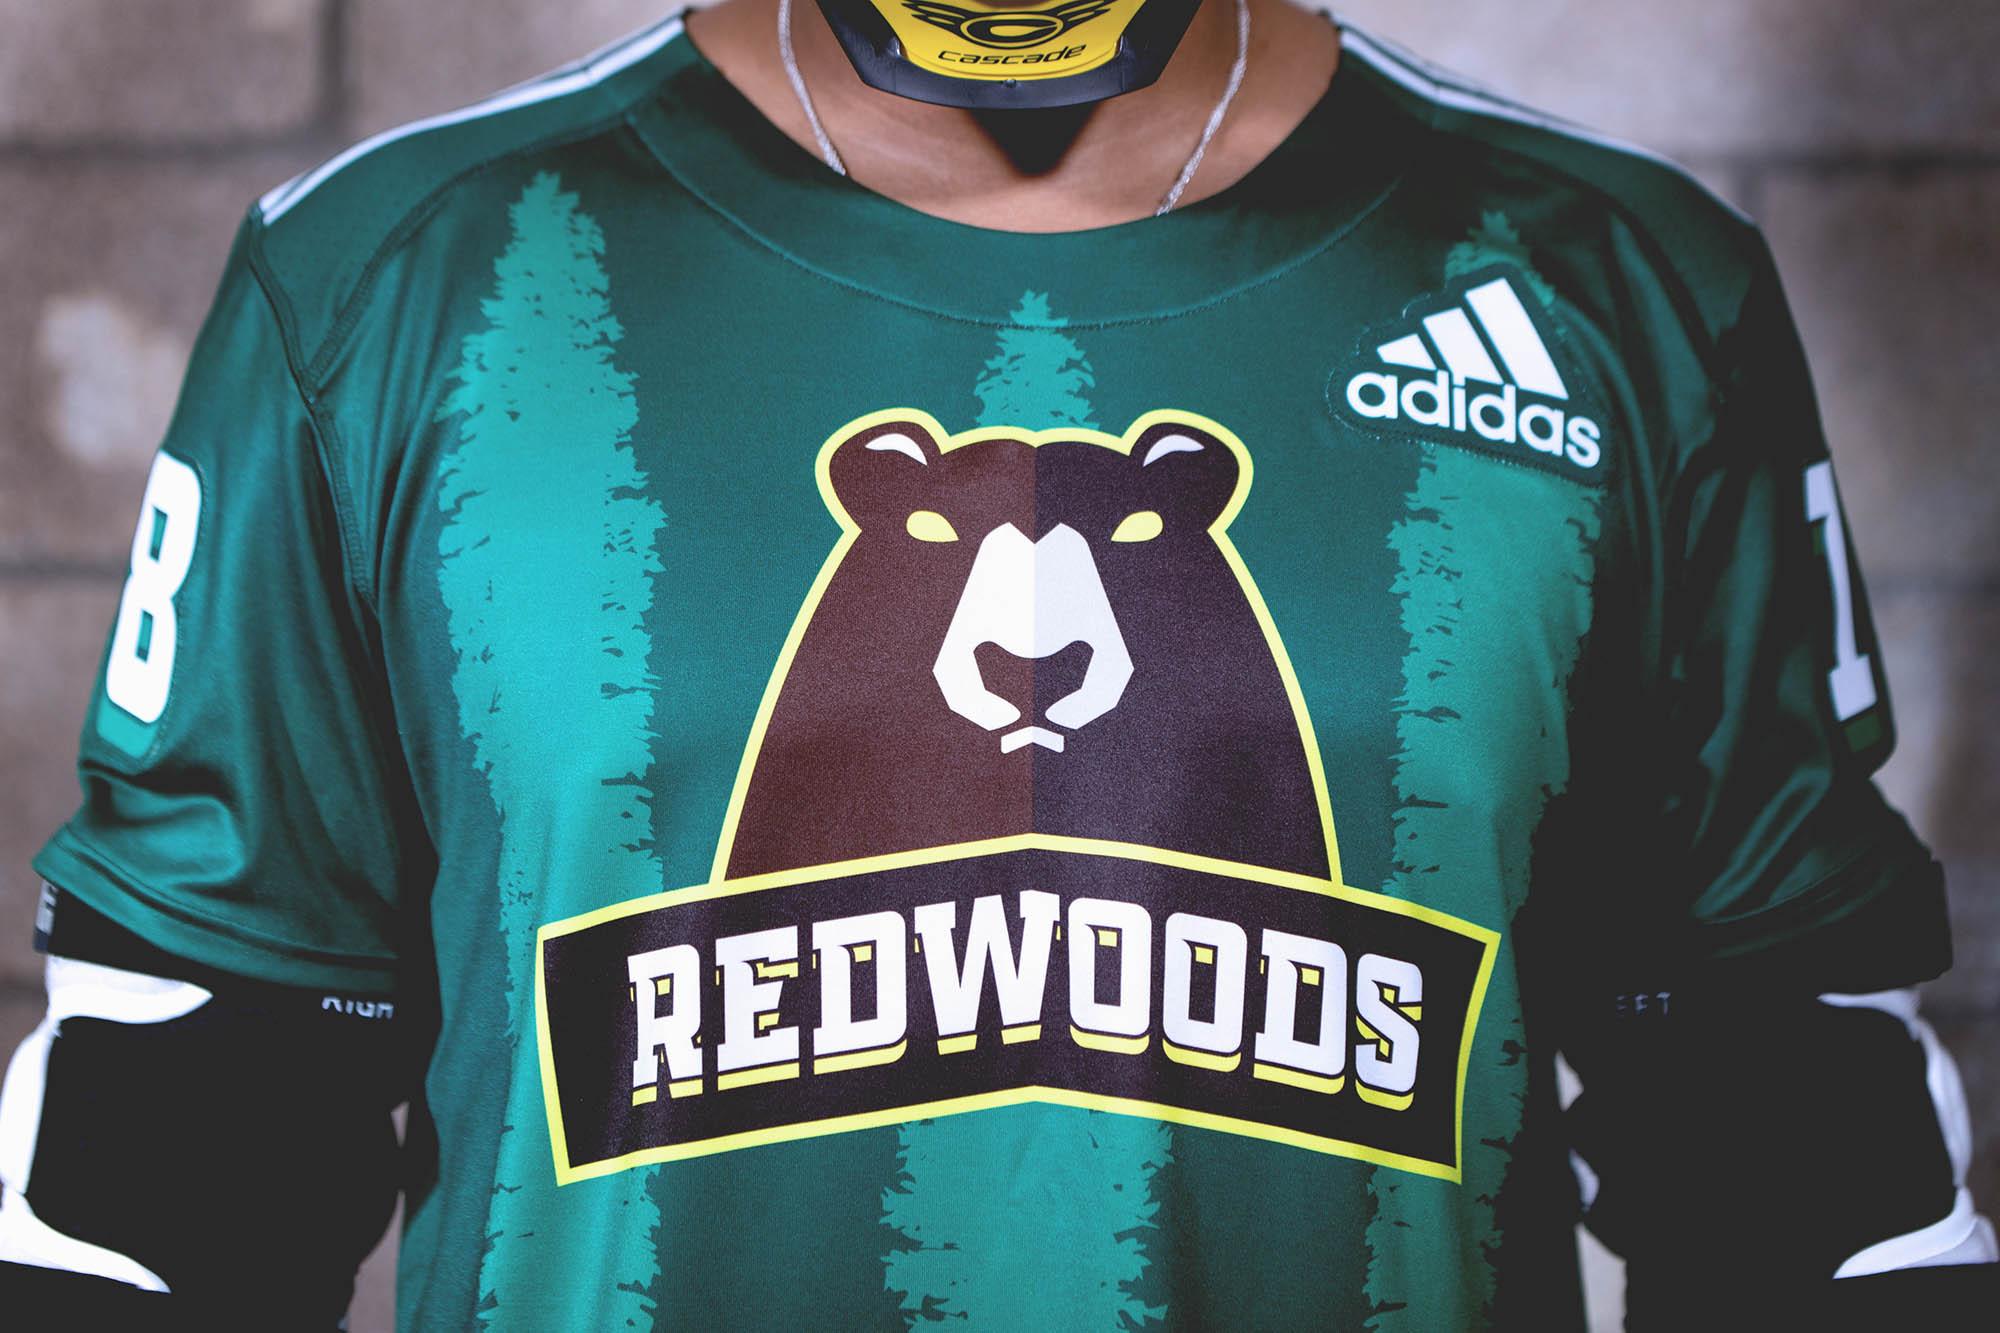 adidasLacrosse_PLL_REDWOODS_Crest_Home_01.jpg